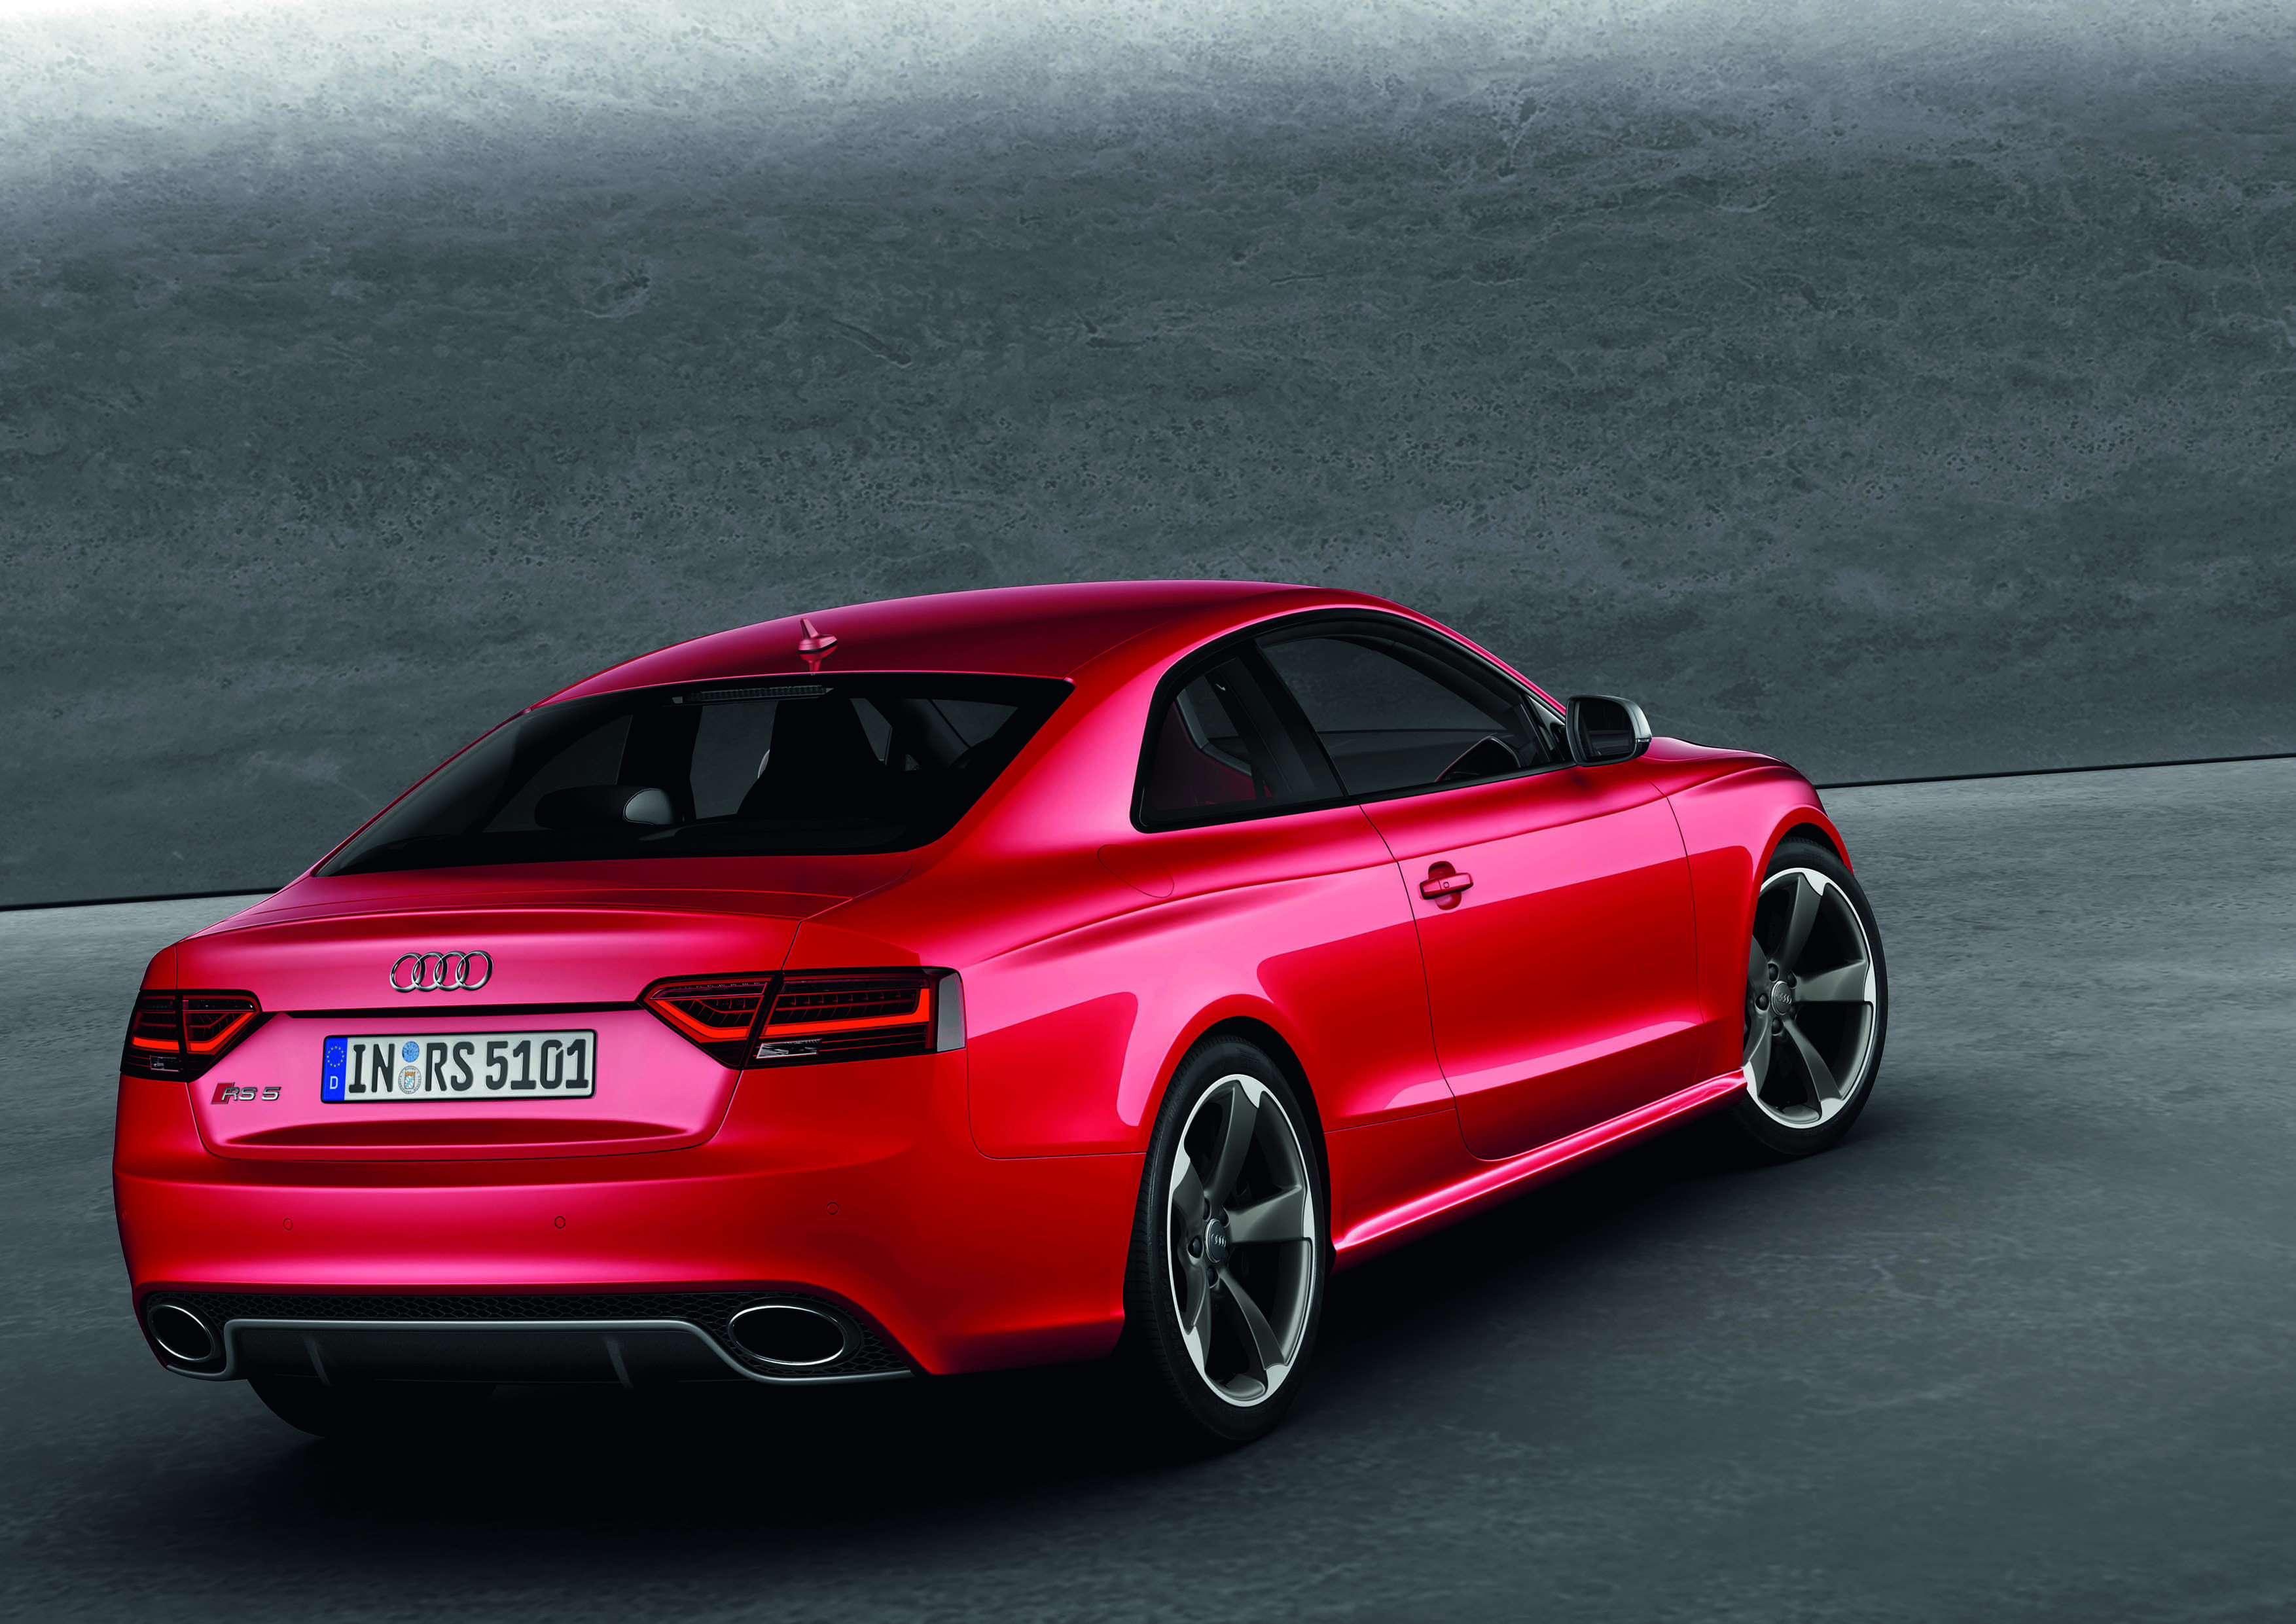 2012 Audi RS5 Widescreen for desktop